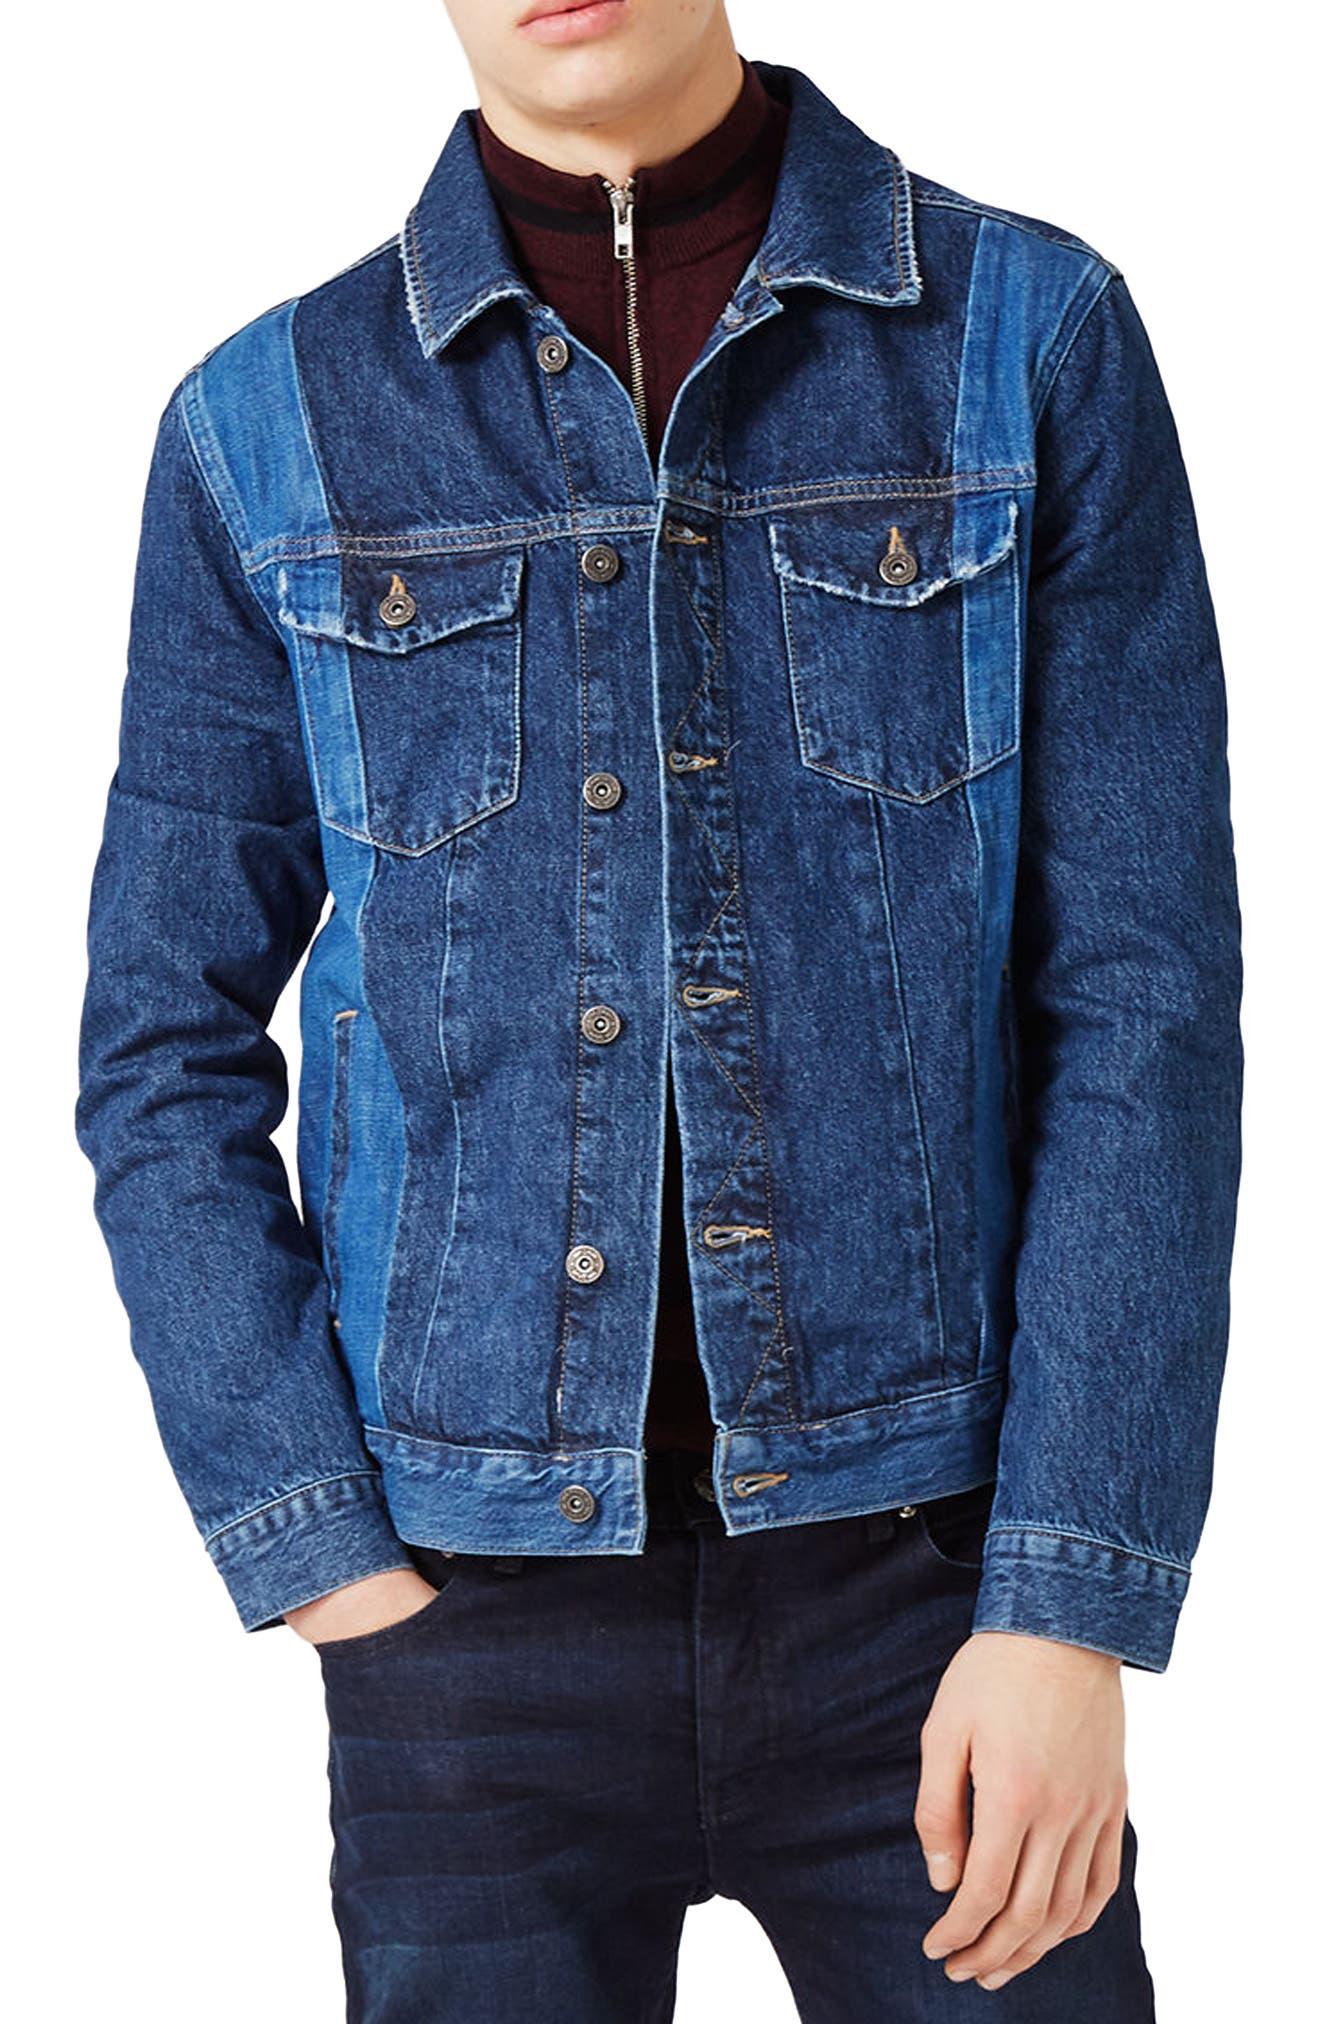 Main Image - Topman Two-Tone Denim Jacket